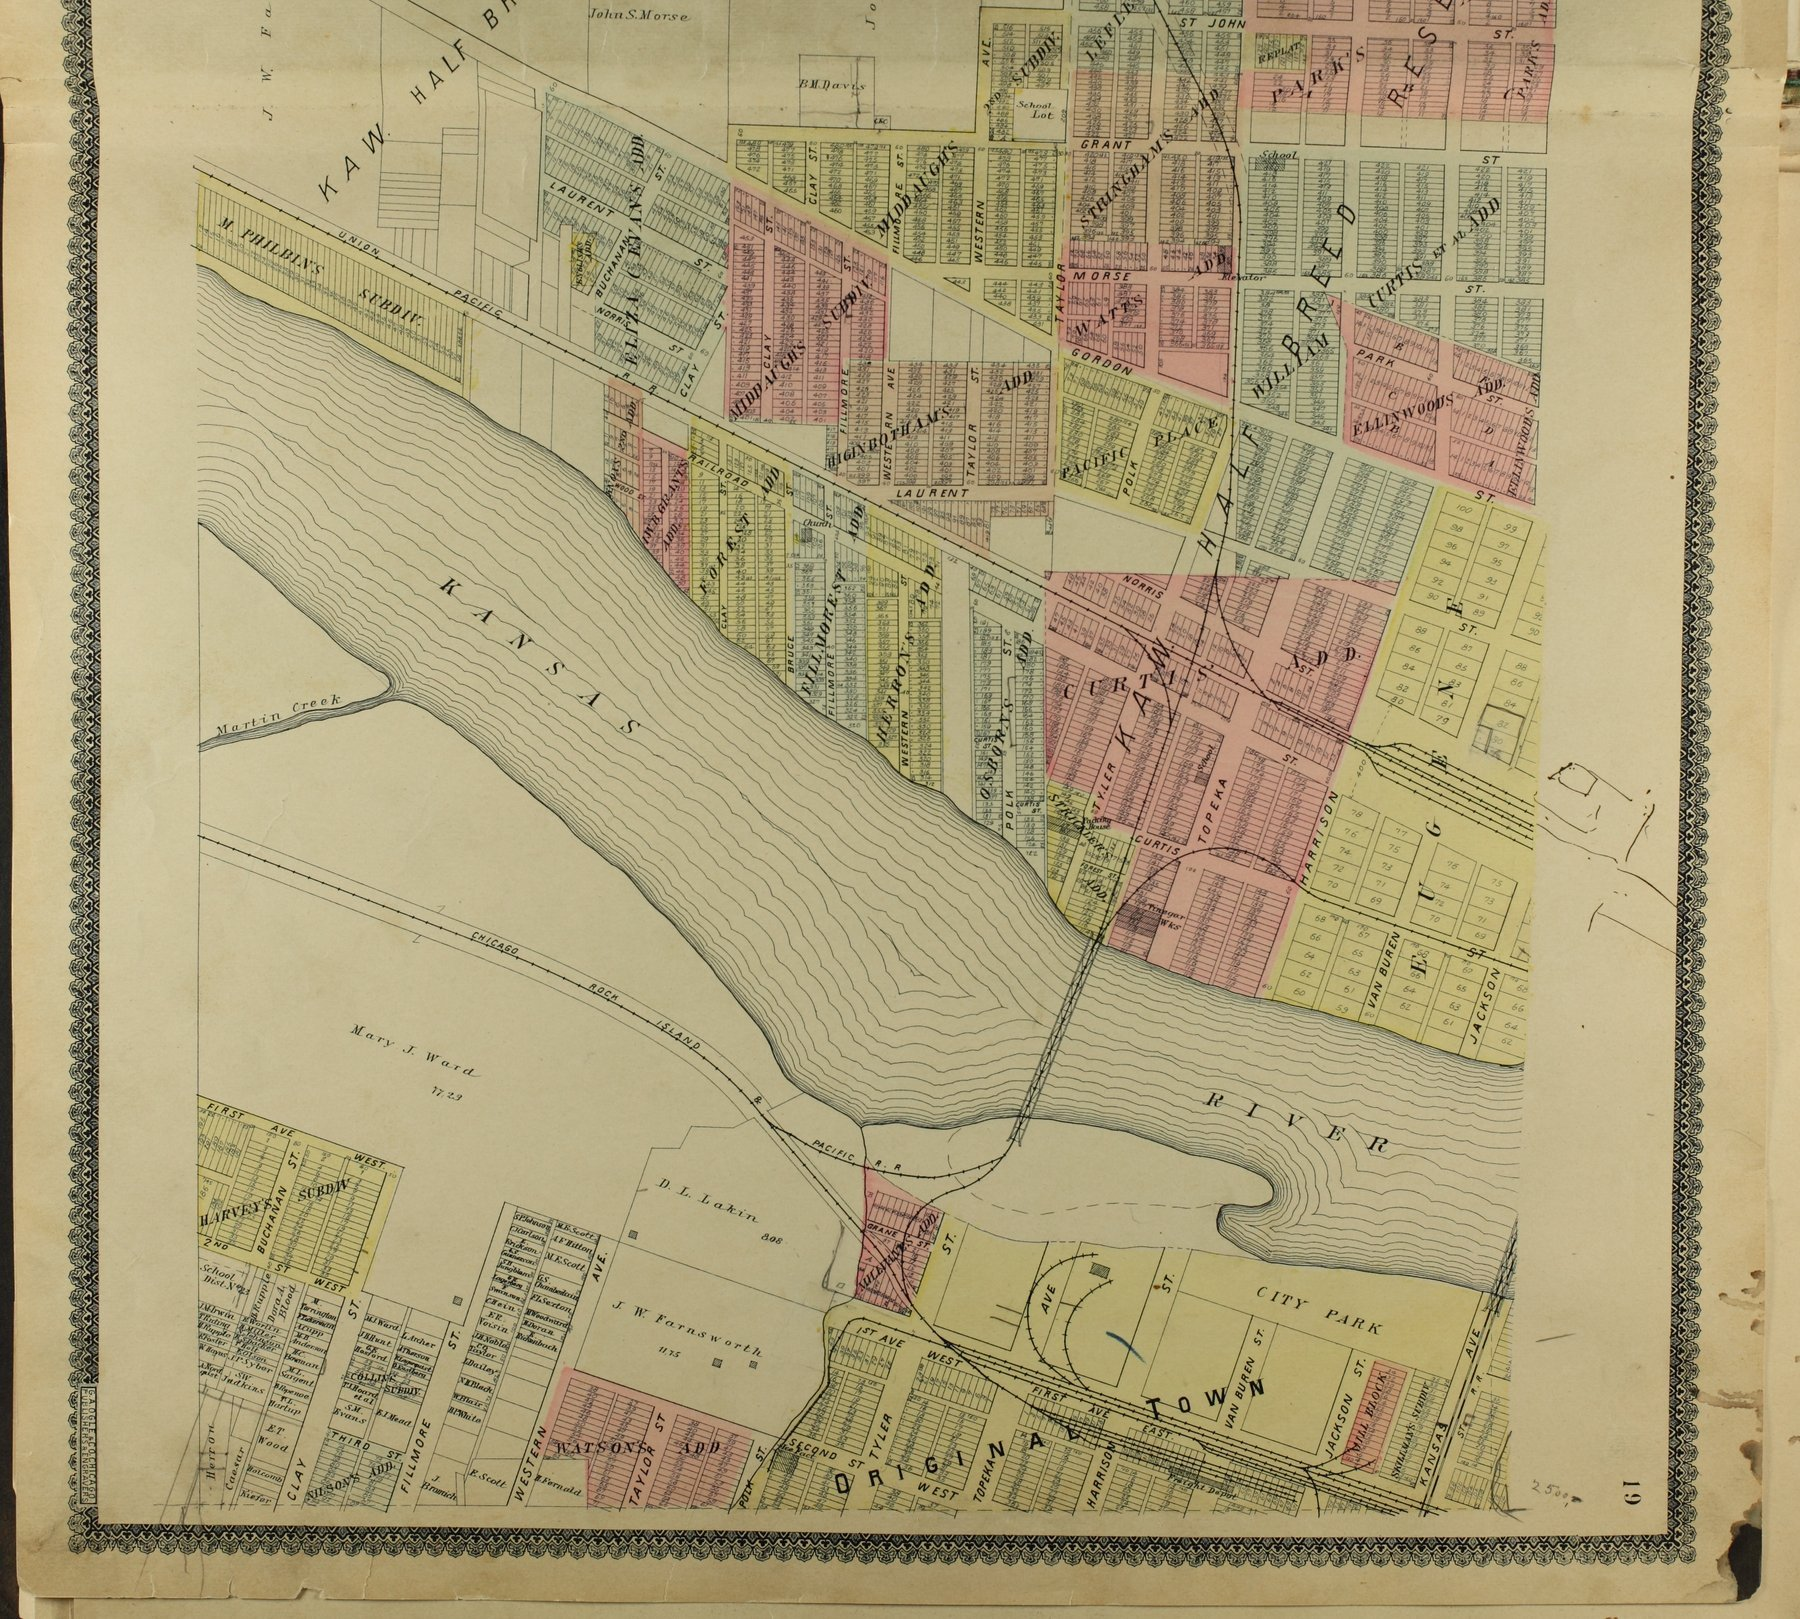 Standard atlas of Shawnee County, Kansas - 19